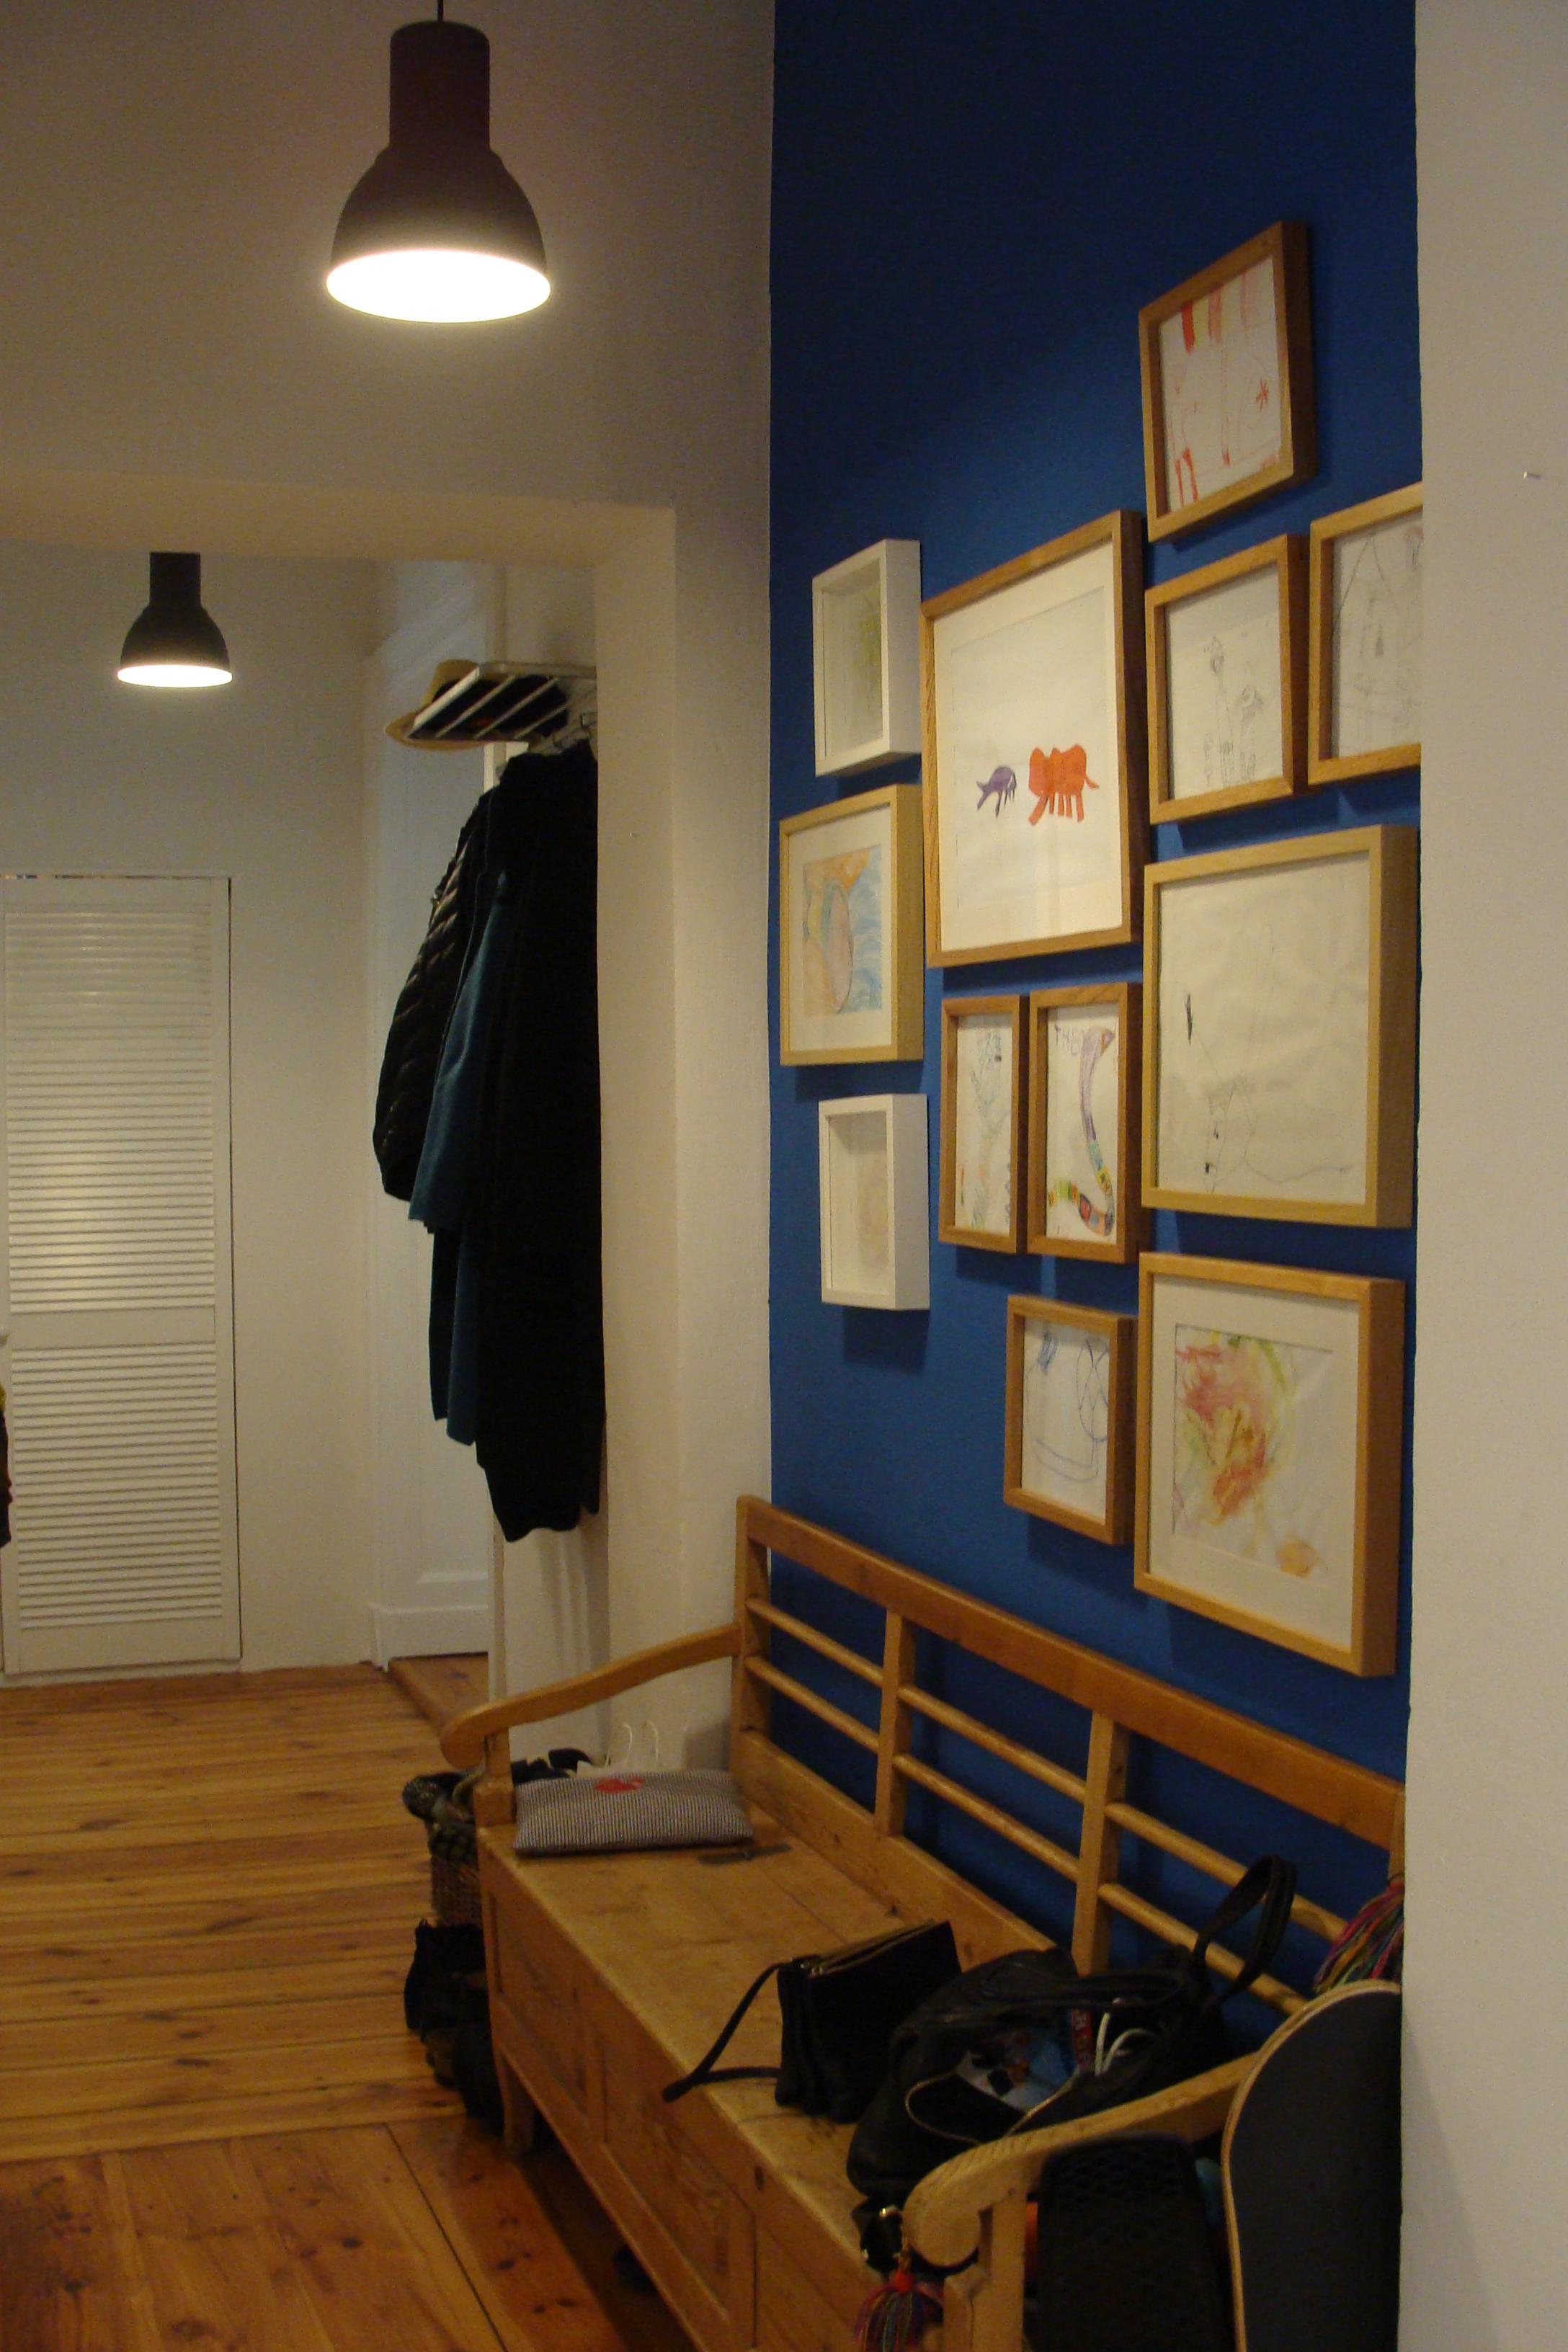 Dunkelblaue Wand Betont Den Flur #sitzgelegenheit #wandgestaltungflur  #flurbeleuchtung ©Mareike Kühn Interior Stylist